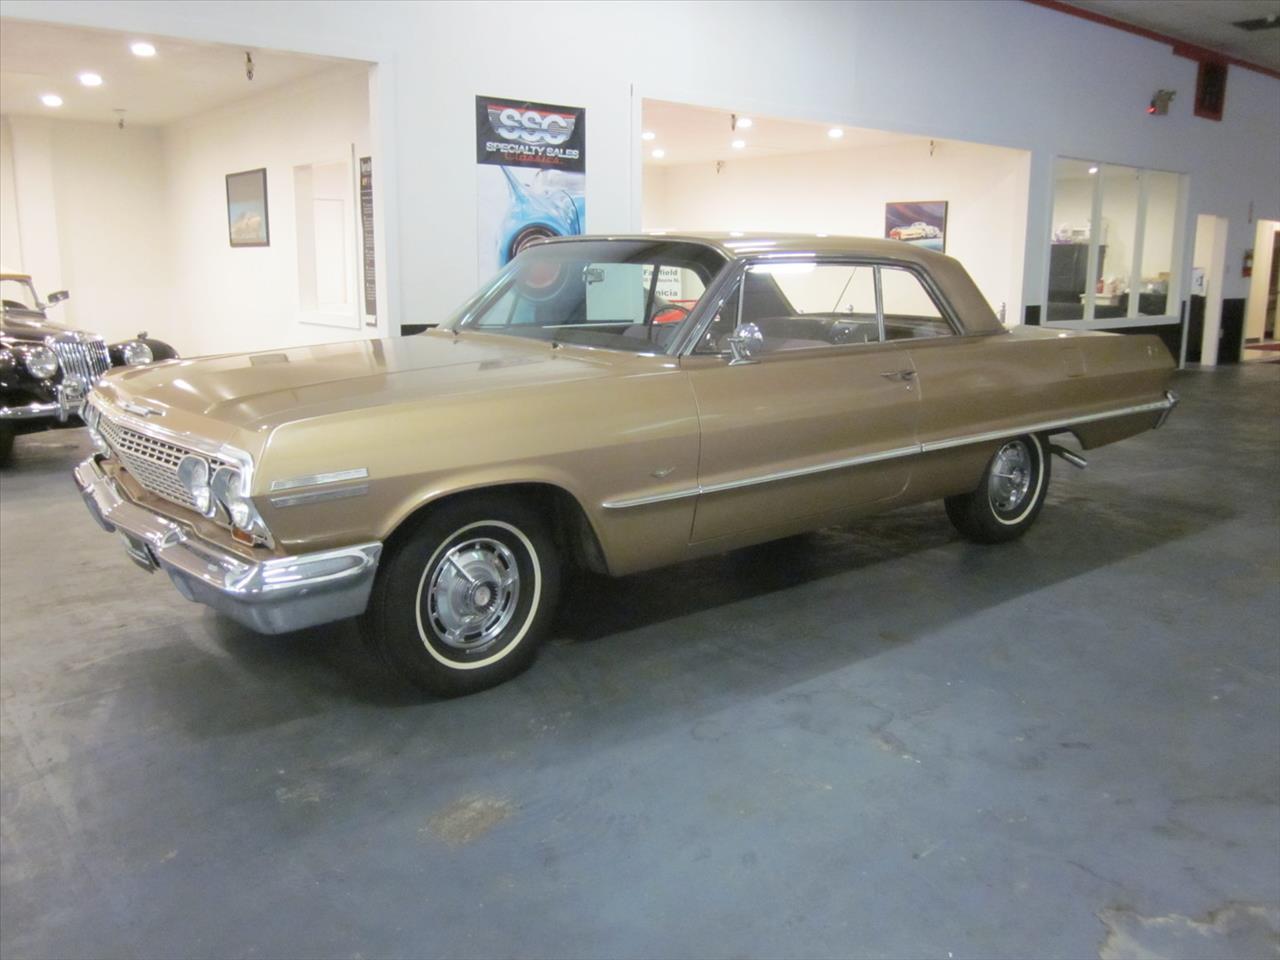 1963 chevrolet impala for sale in redwood city ca. Black Bedroom Furniture Sets. Home Design Ideas